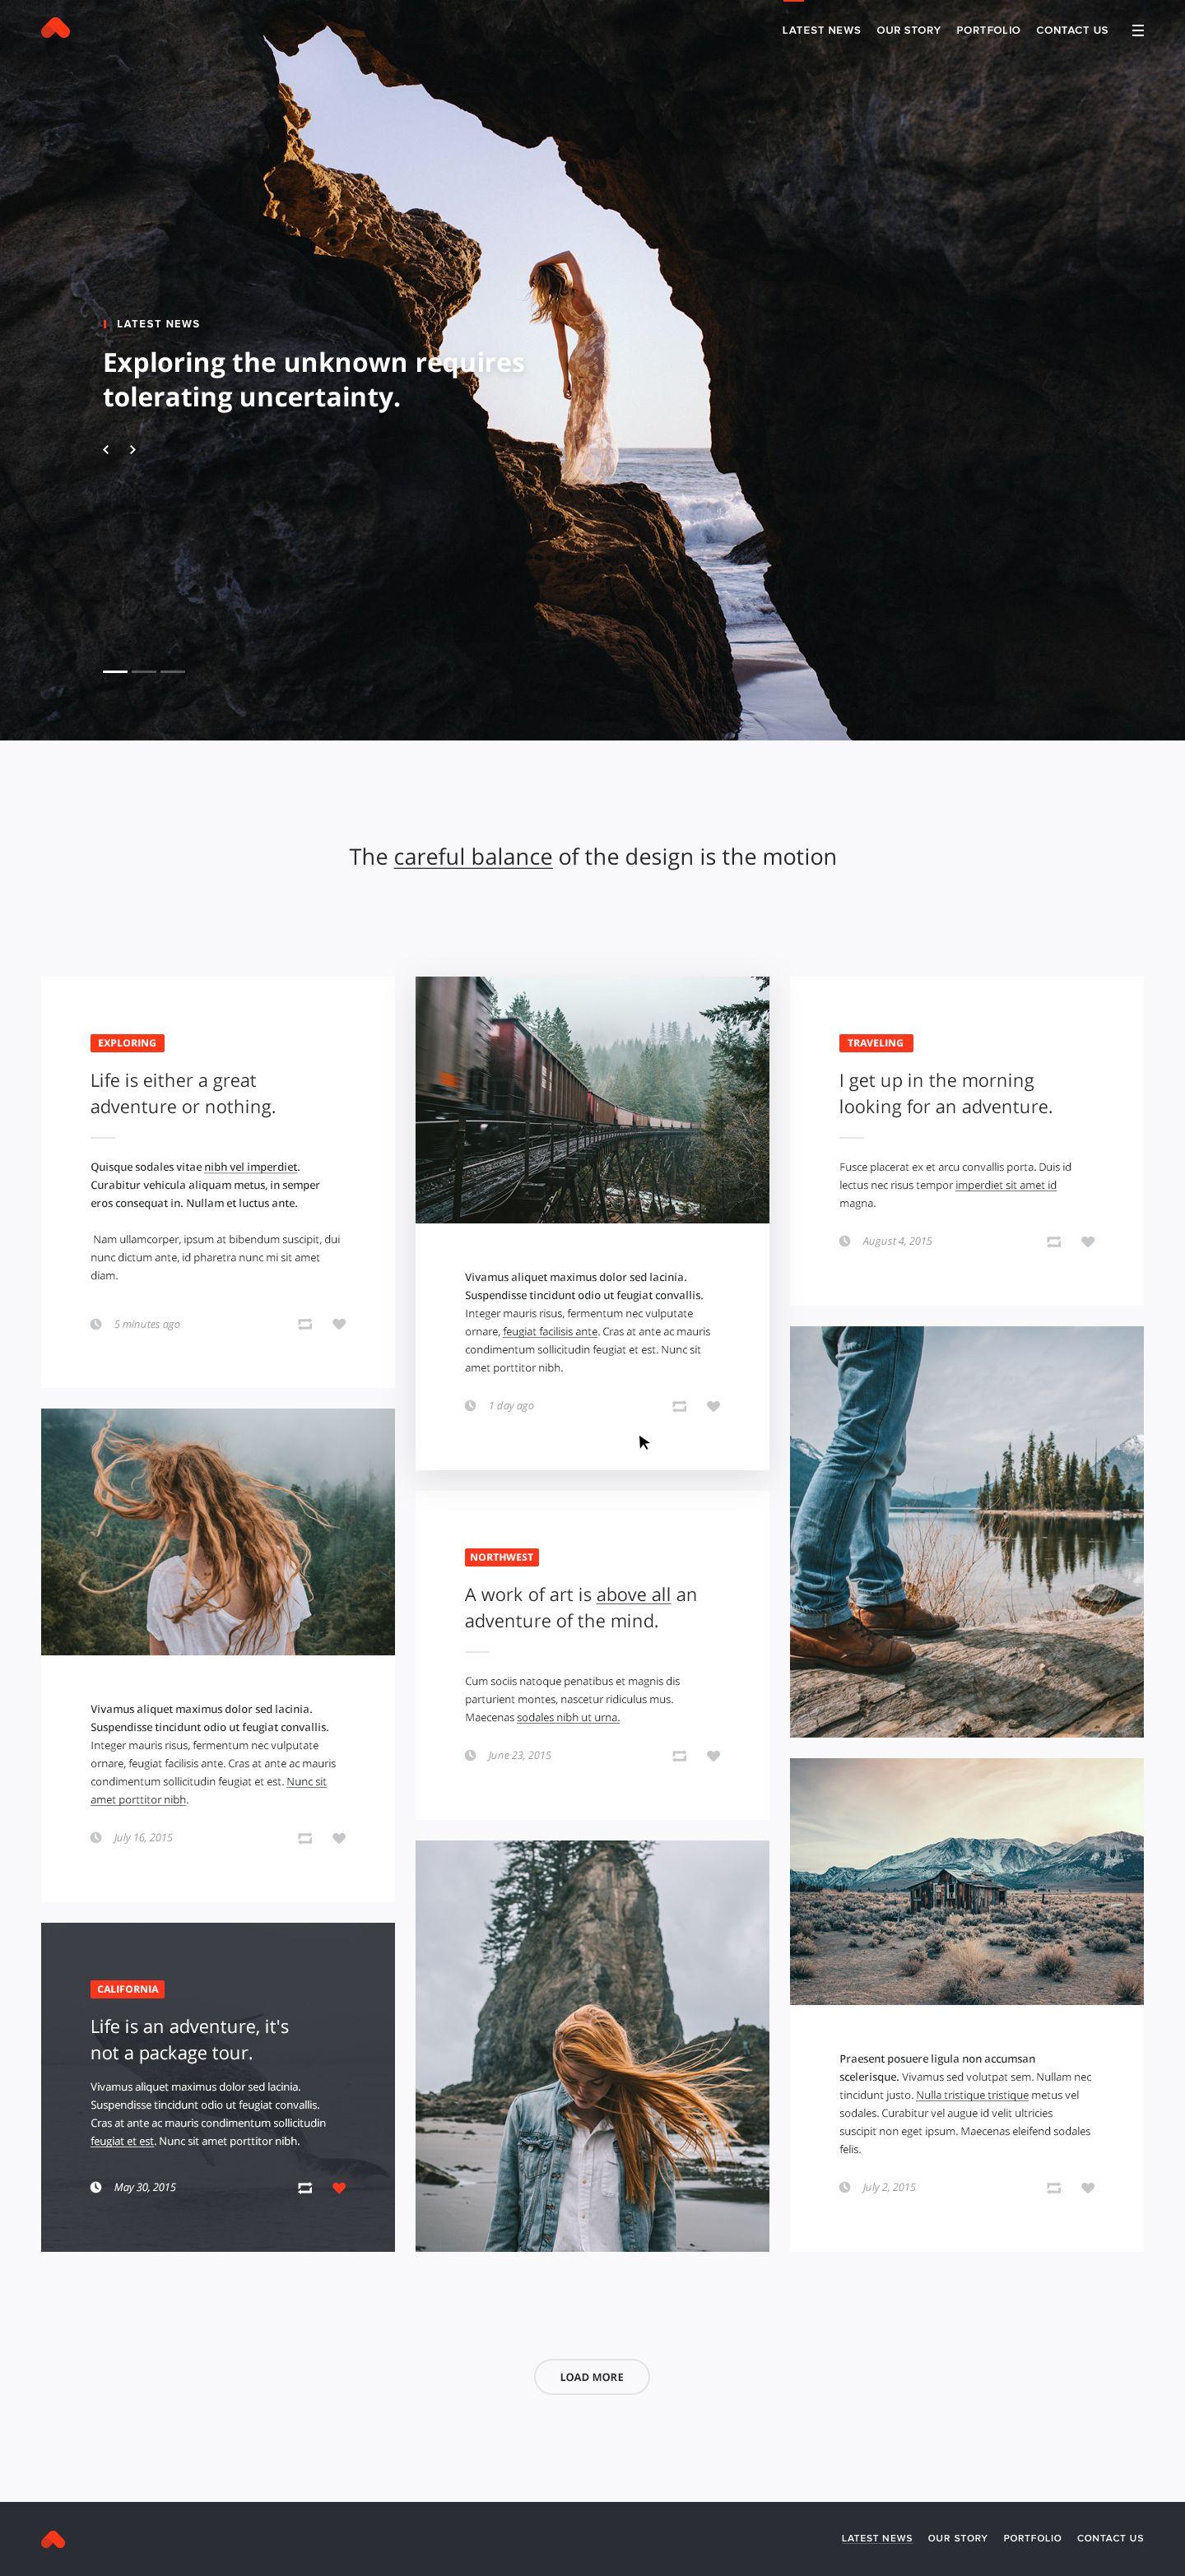 Index Jpg By Andrew Baygulov Travel Website Design Blog Layout Design Travel Blog Design